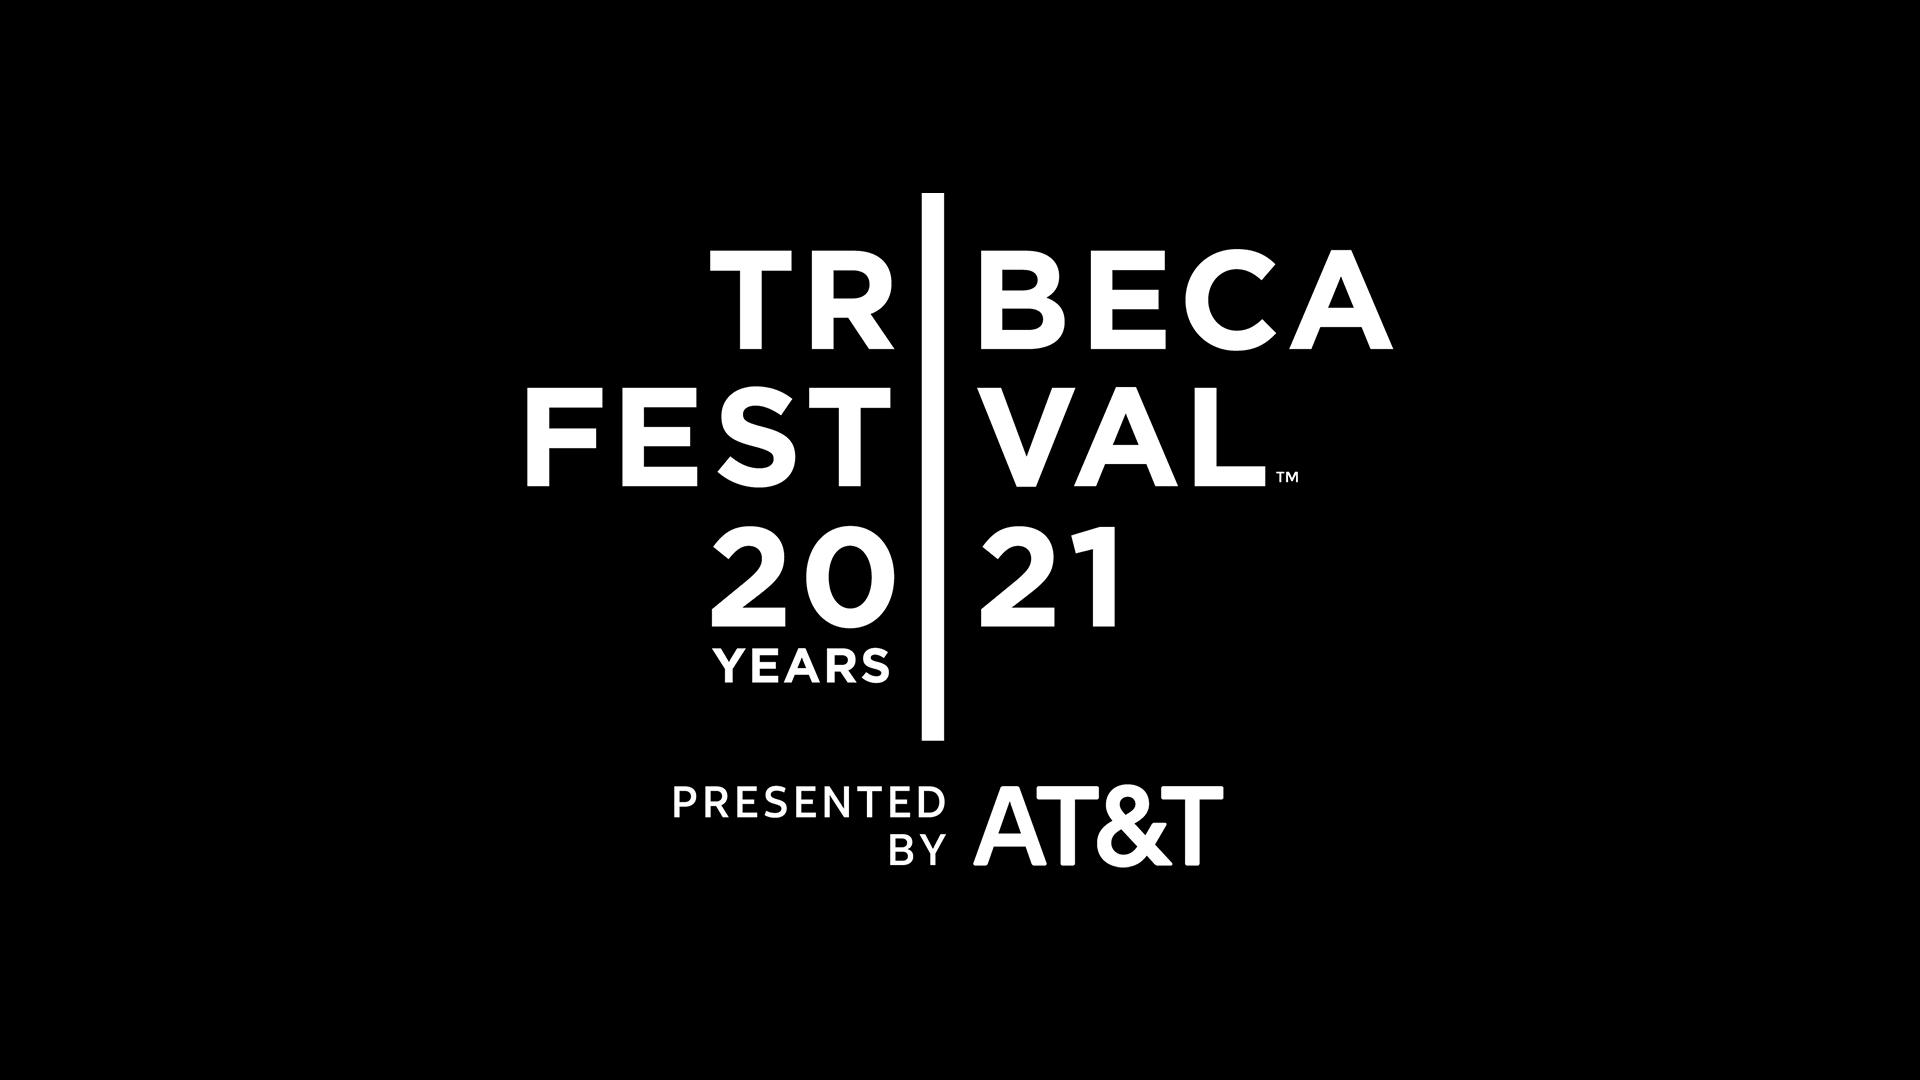 tribeca festival press banner